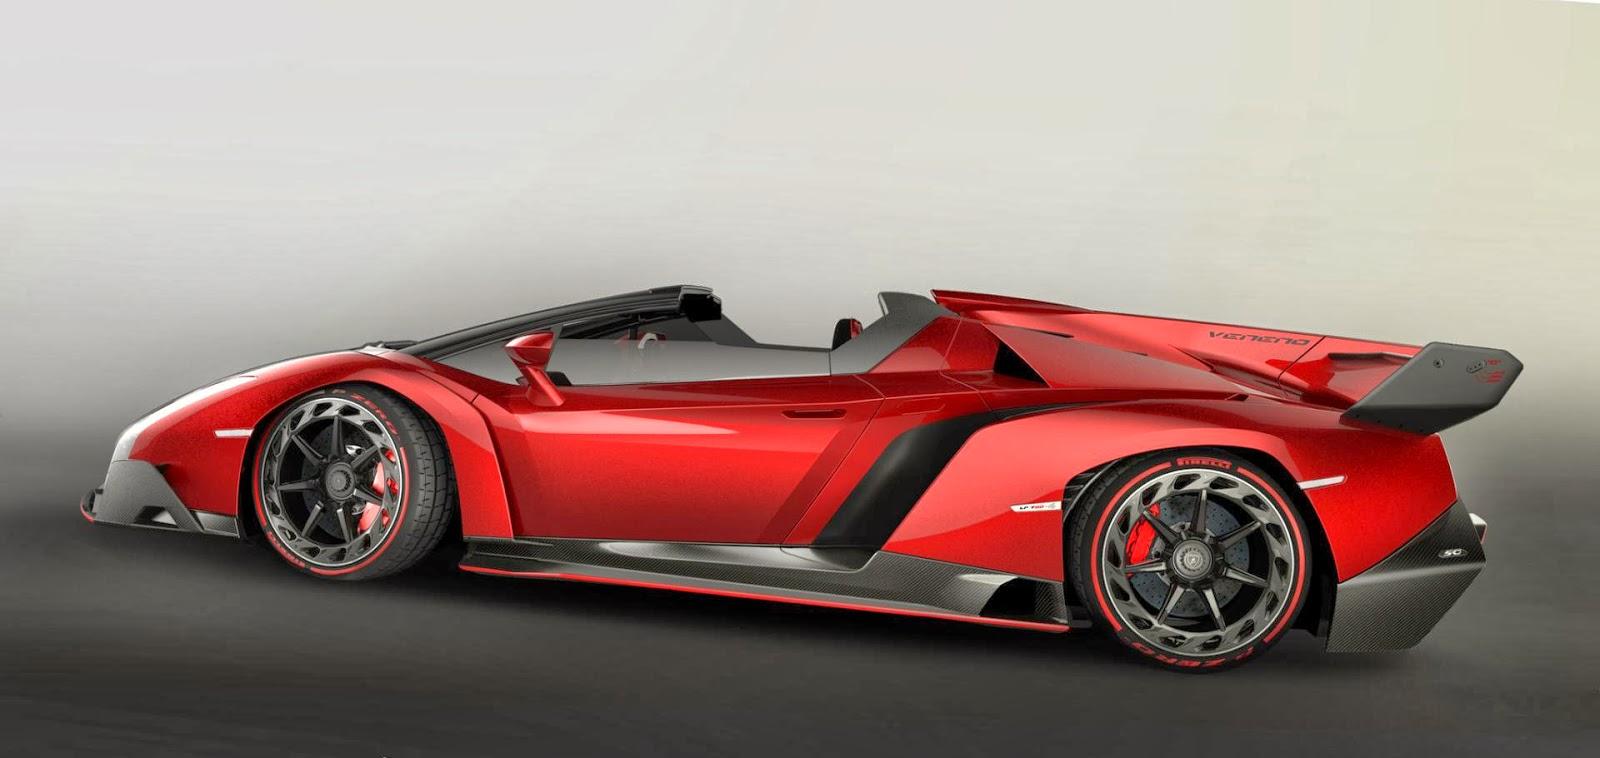 Lamborghini Veneno Roadster 2013 Hottest Car Wallpapers